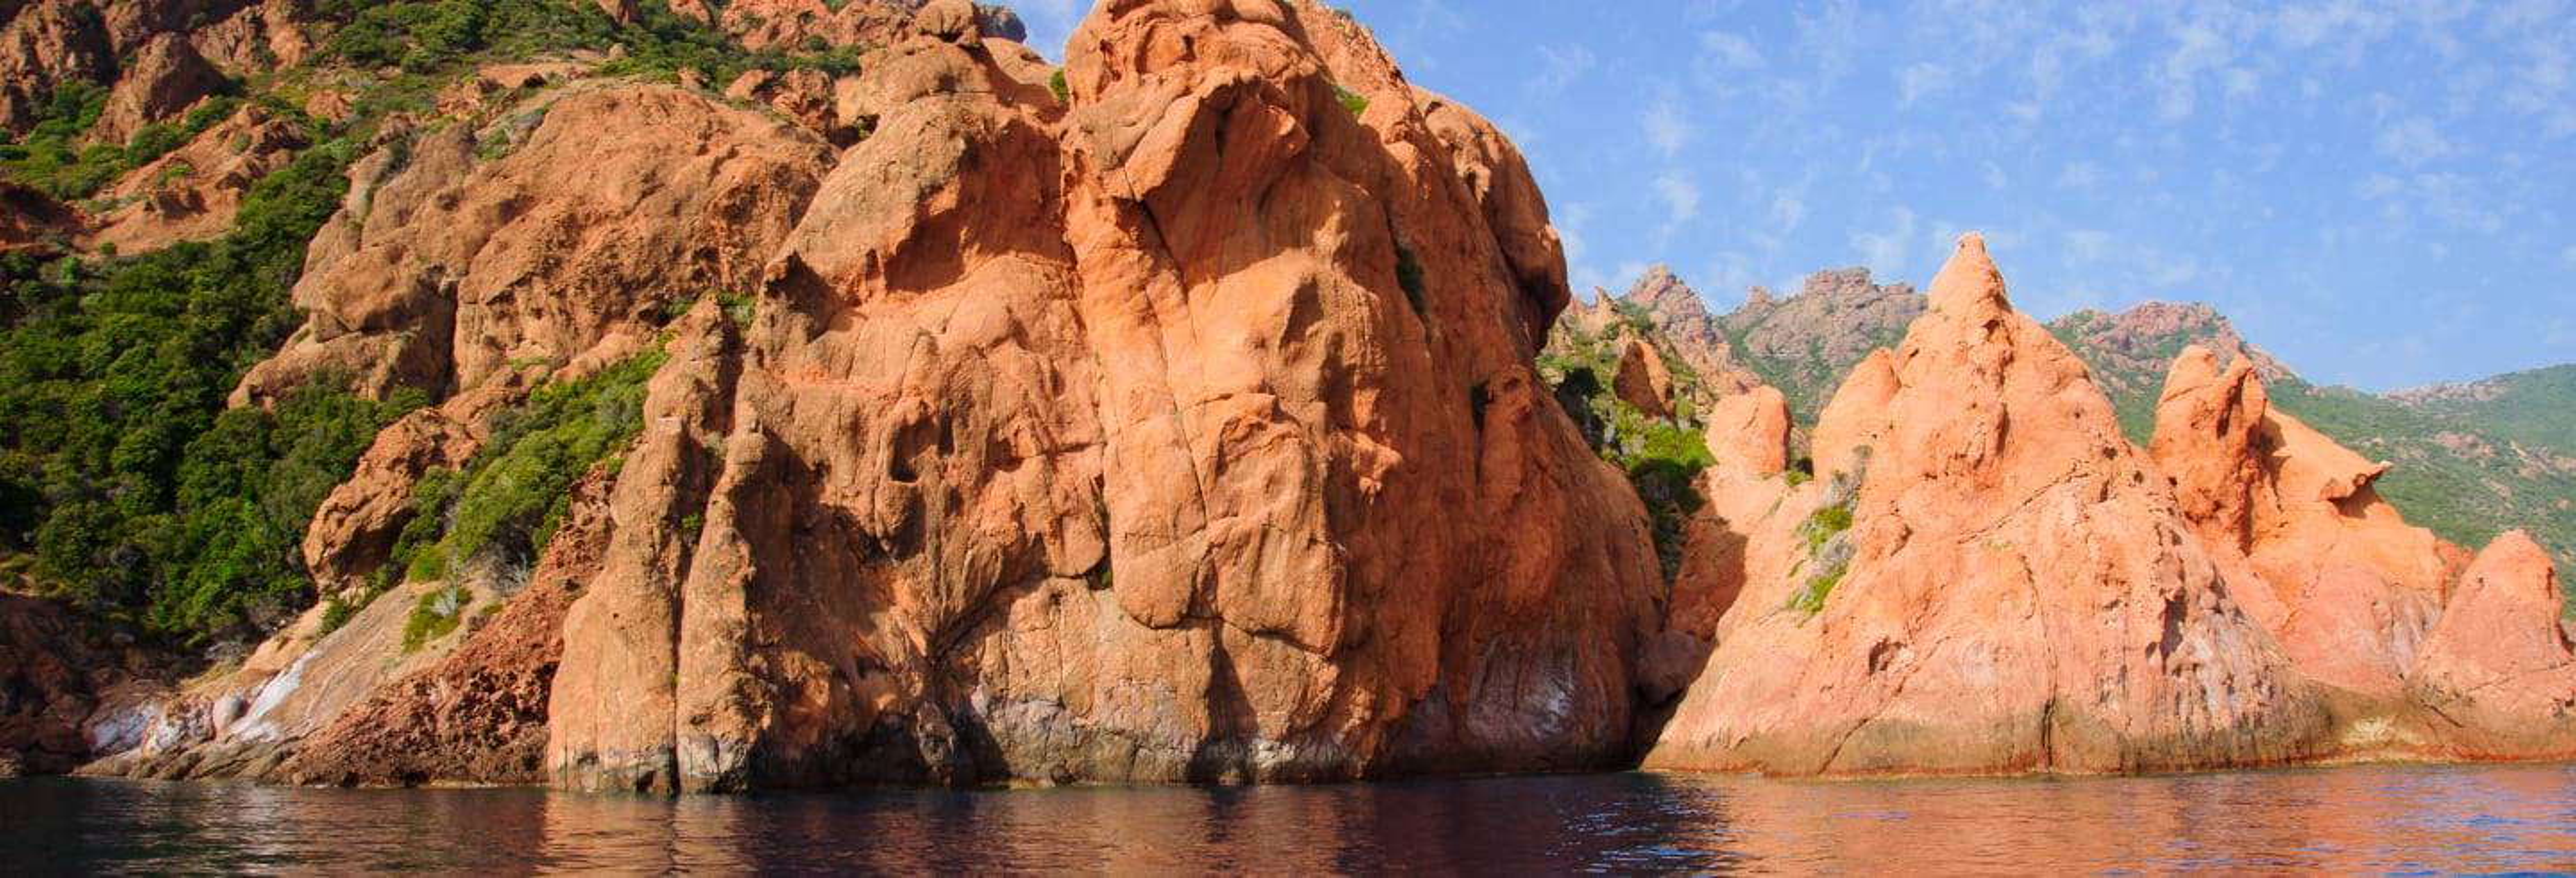 Escursione in barca a Scandola e Girolata